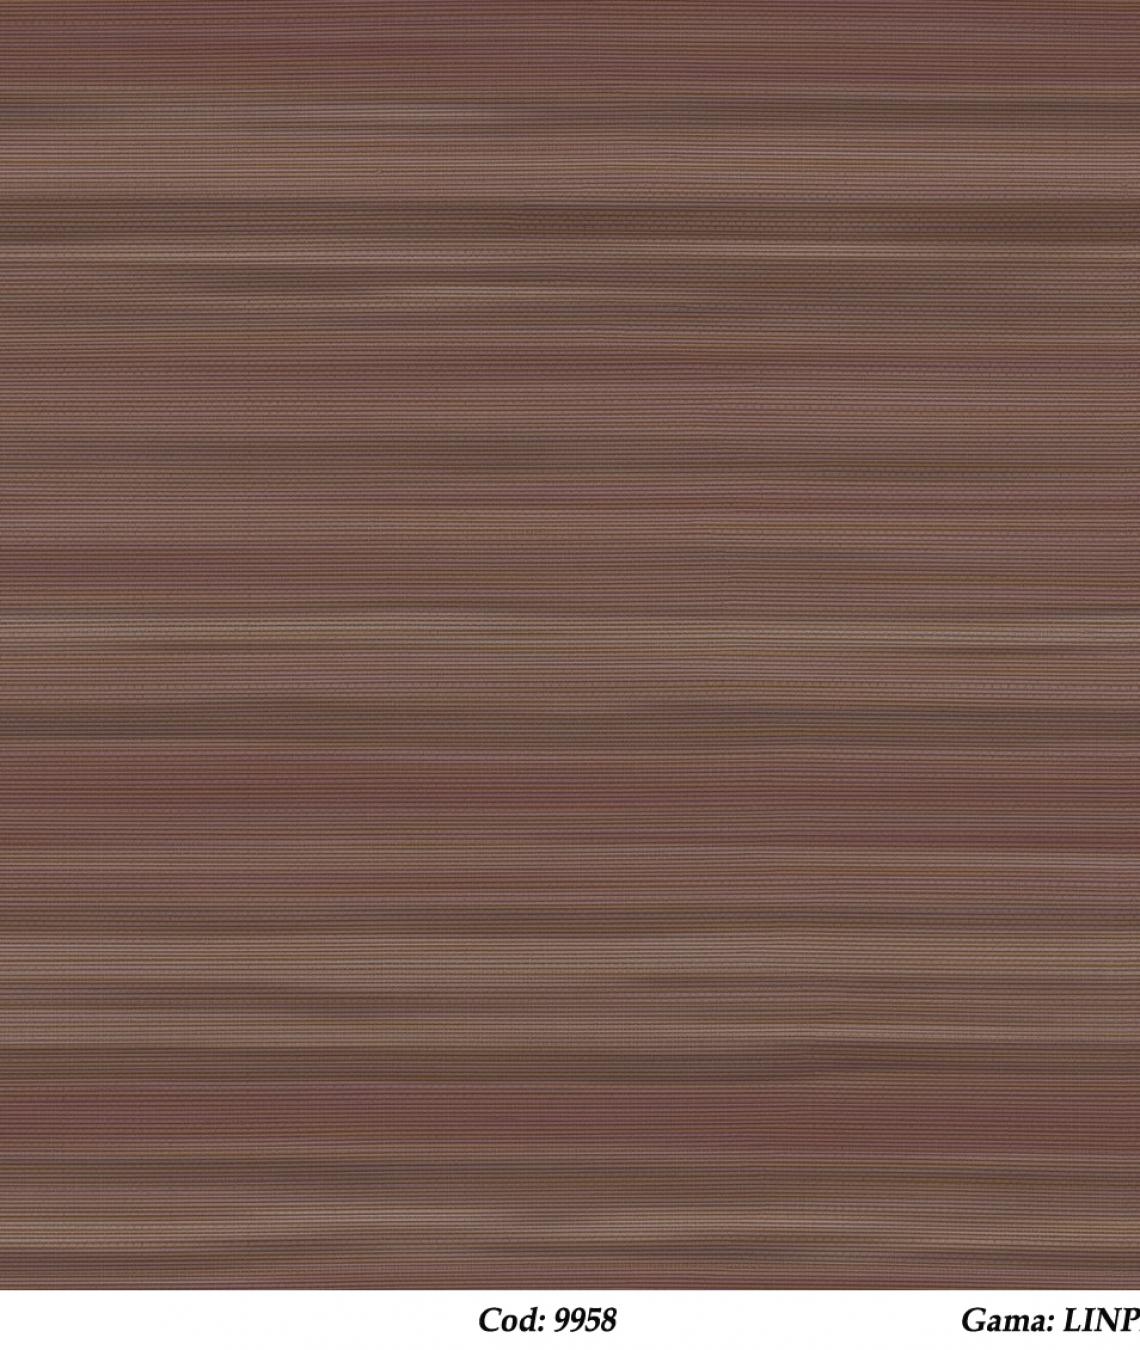 tapet-cu-dungi-orizontale-cod-9958-gama-linpha